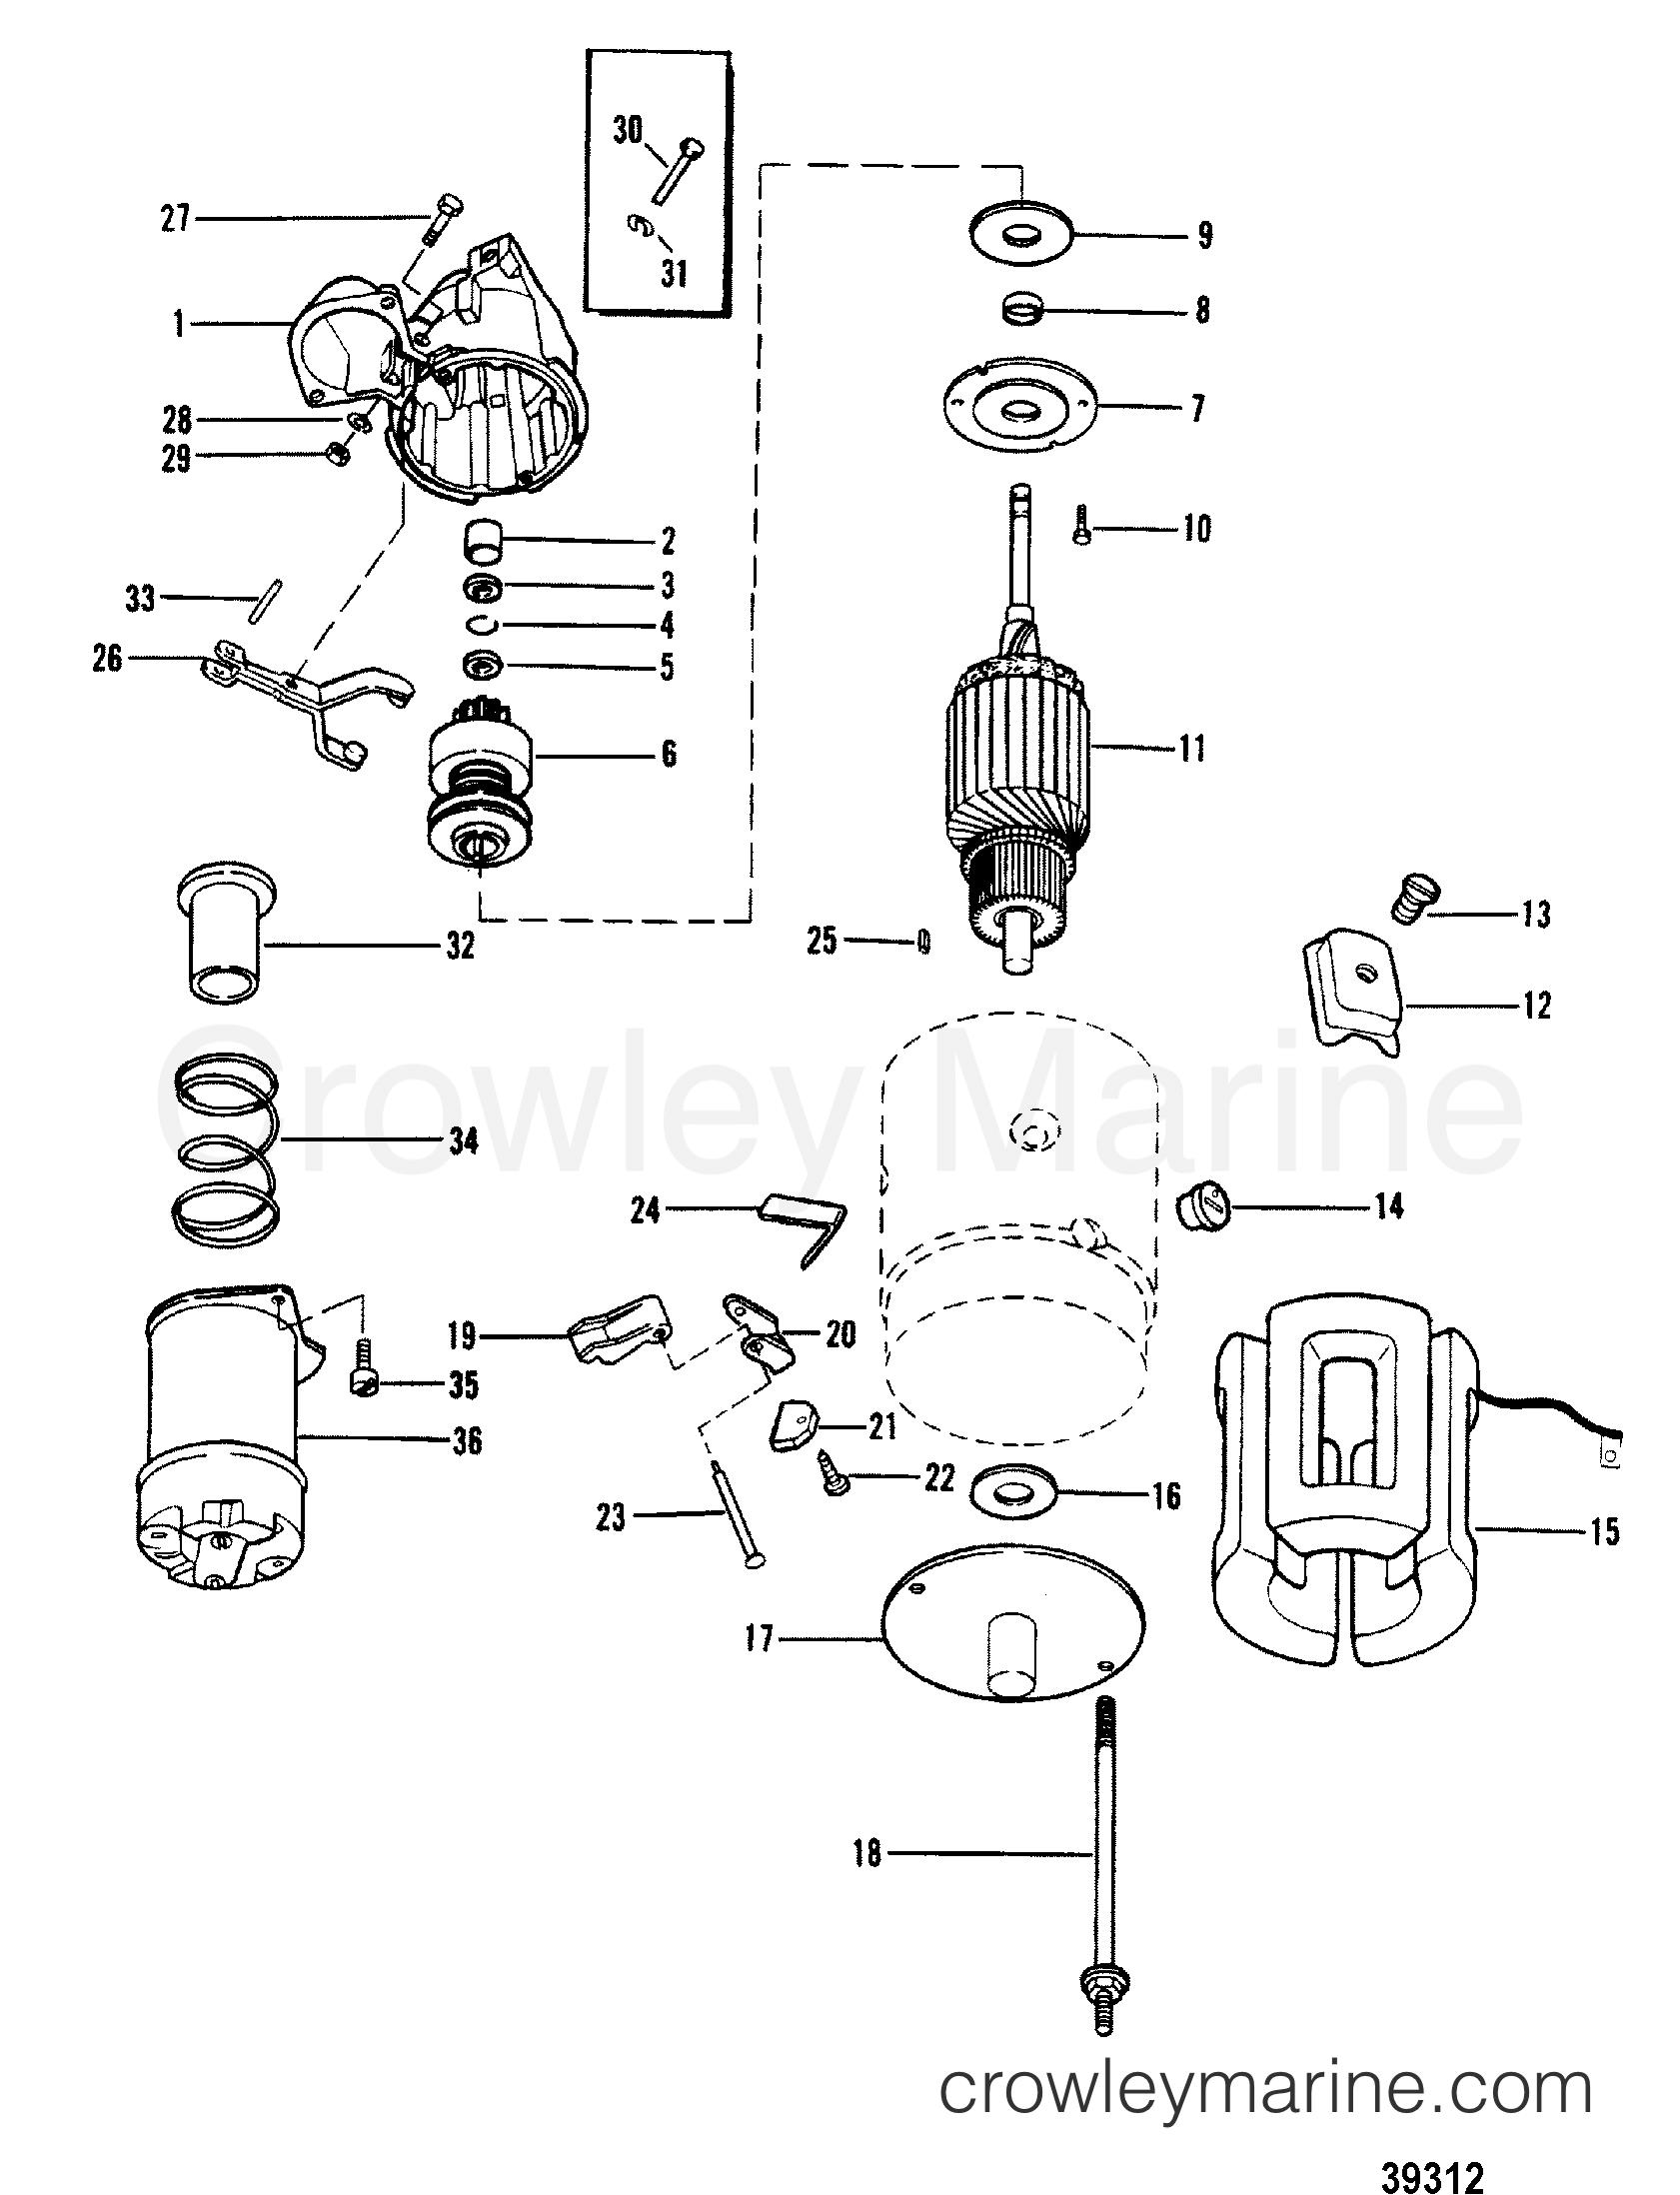 Starter And Flywheel Diagram Download Wiring Diagrams 1954 Chevy Motor Use With 12 3 4 1982 Mercruiser Mc1 Rh Crowleymarine Com Gm Solenoid